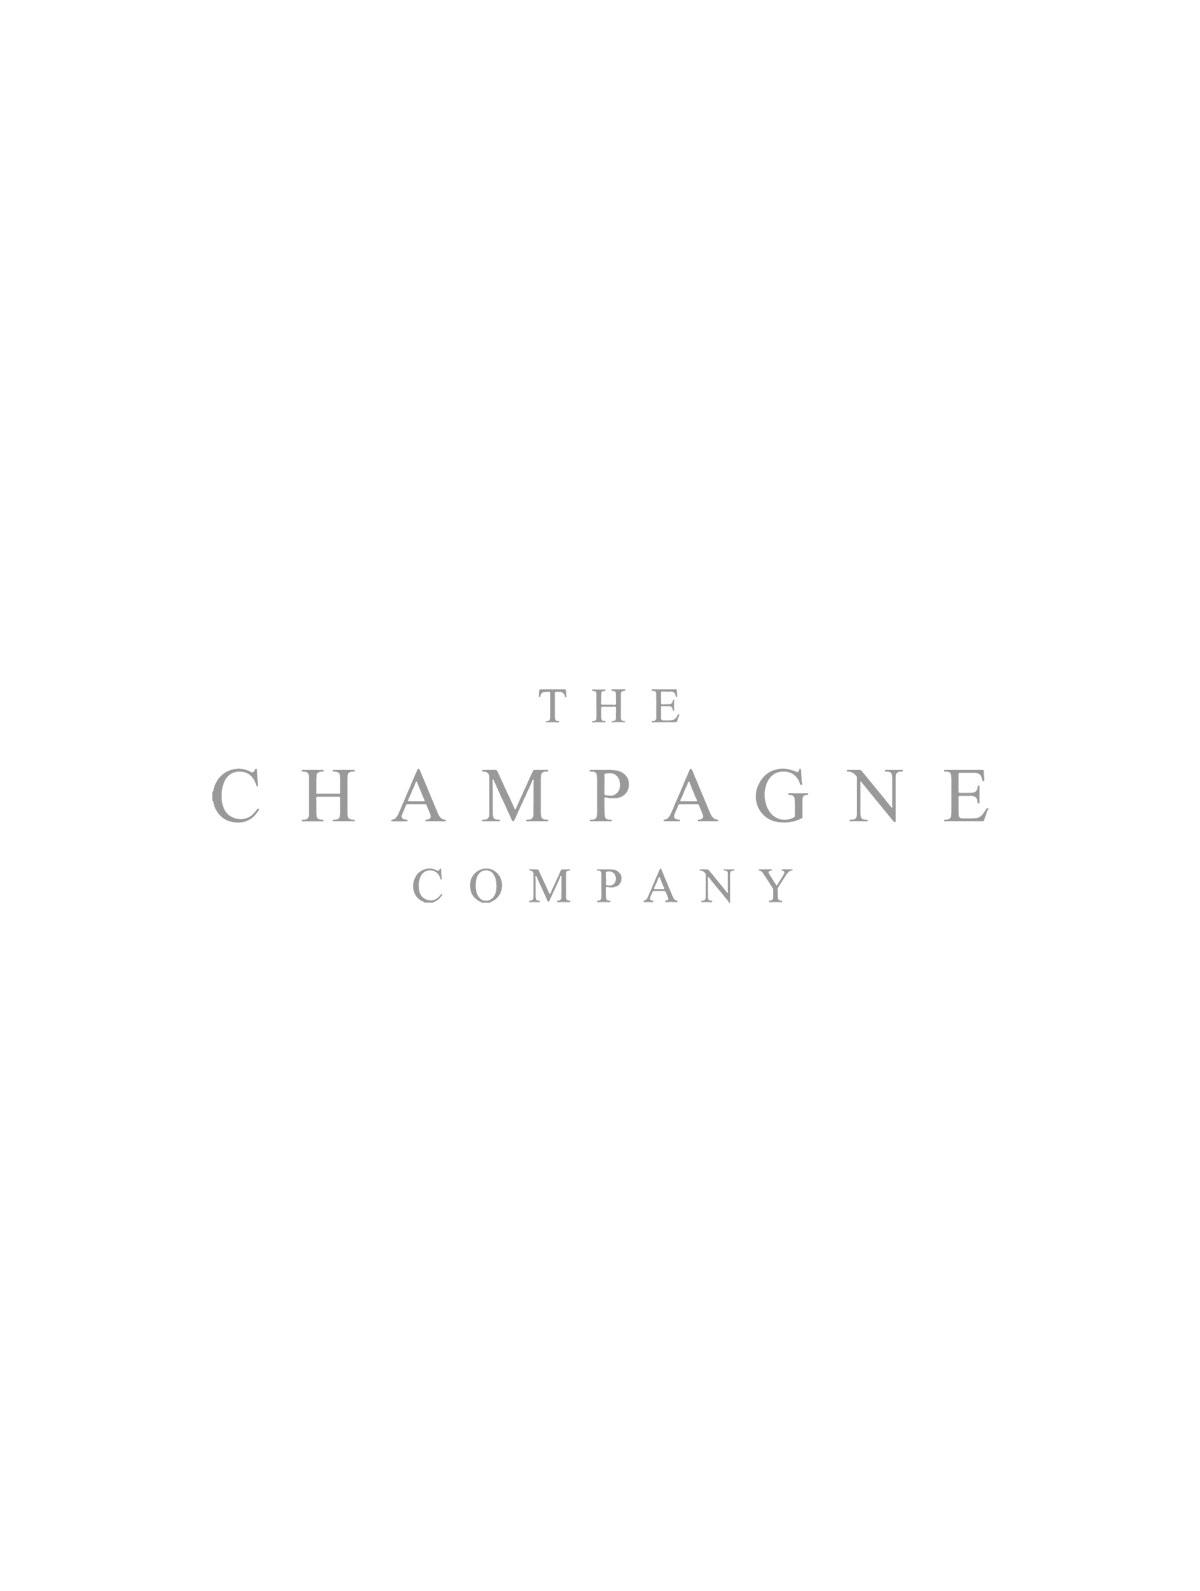 Klein Constantia KC Pinot Noir 2014 South Africa Red Wine 75cl